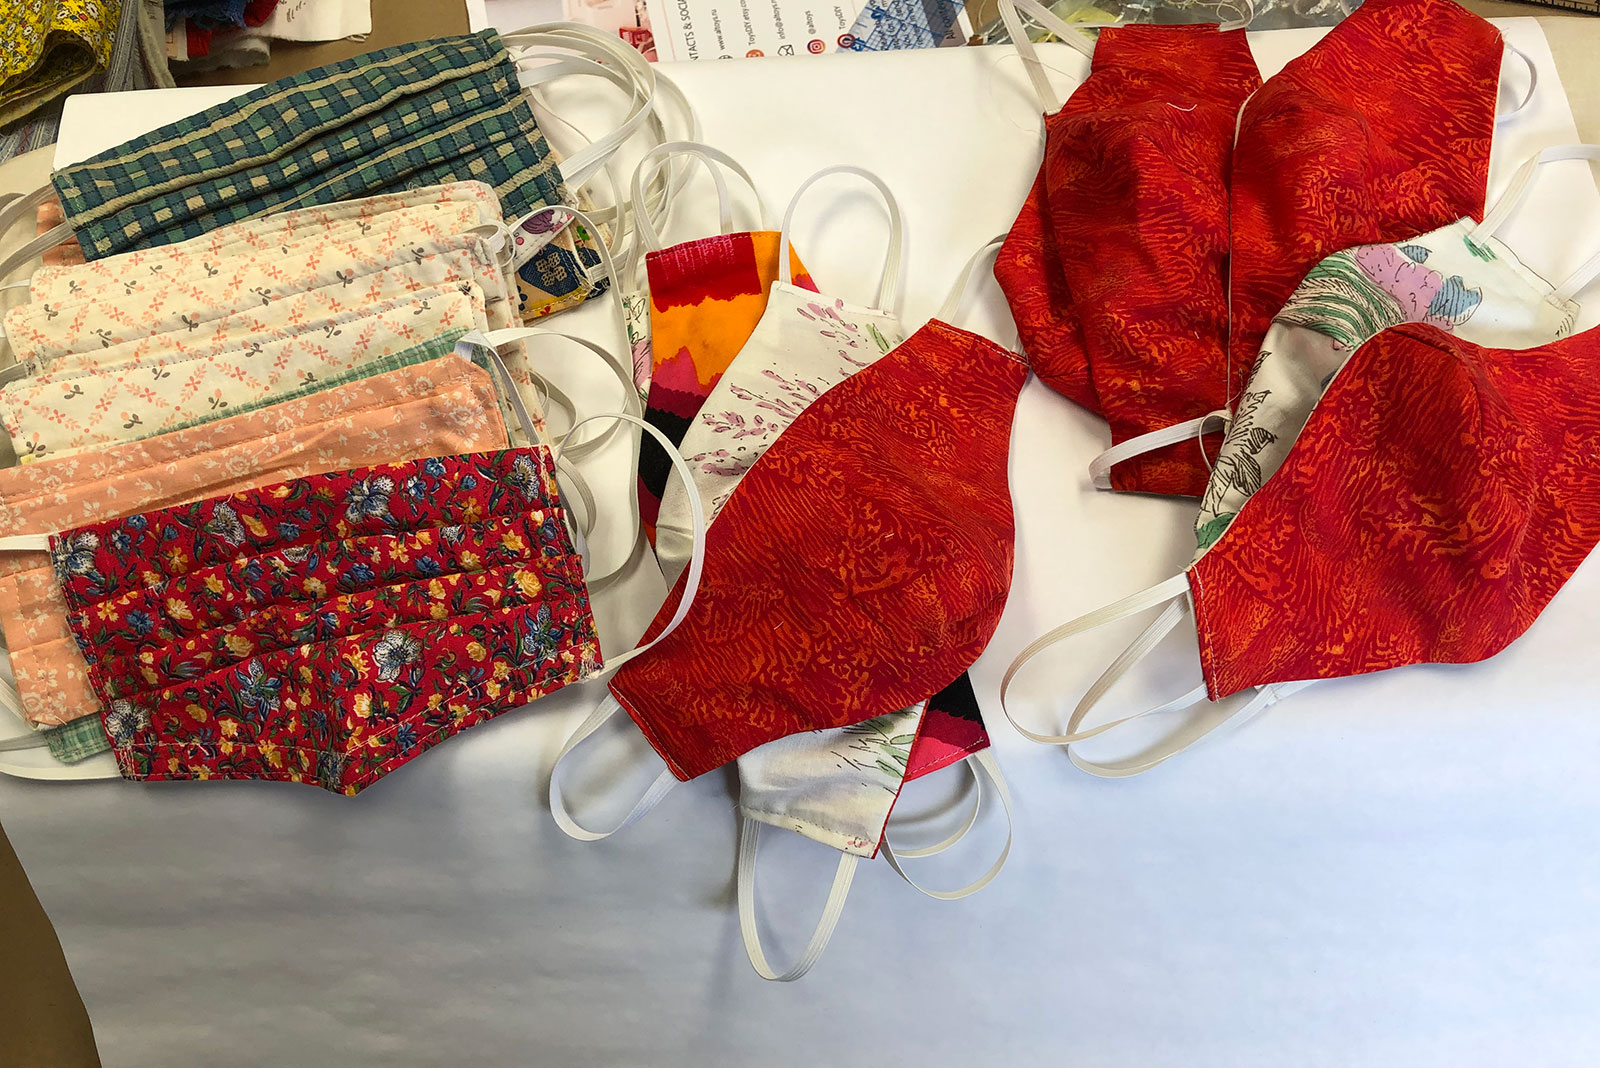 Arts Focus: Arlington Arts Sews Masks in Partnership with Department of Human Services